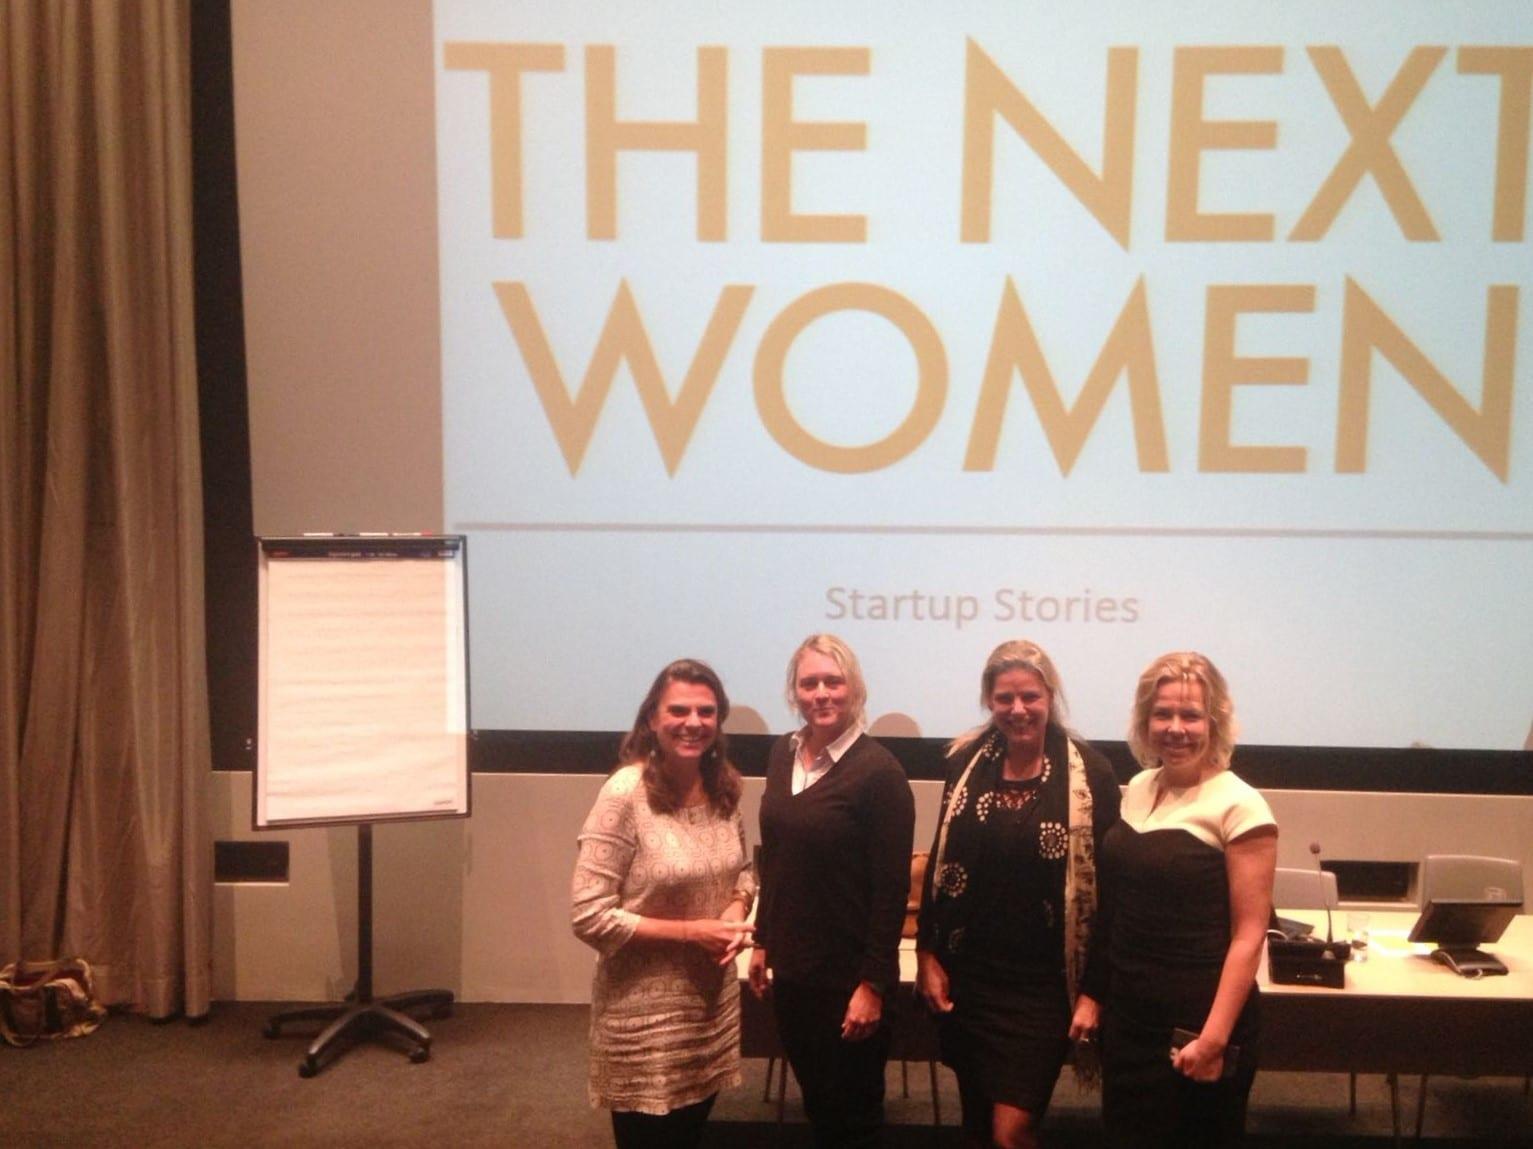 TheNextWomen encourages women to develop their business ideas